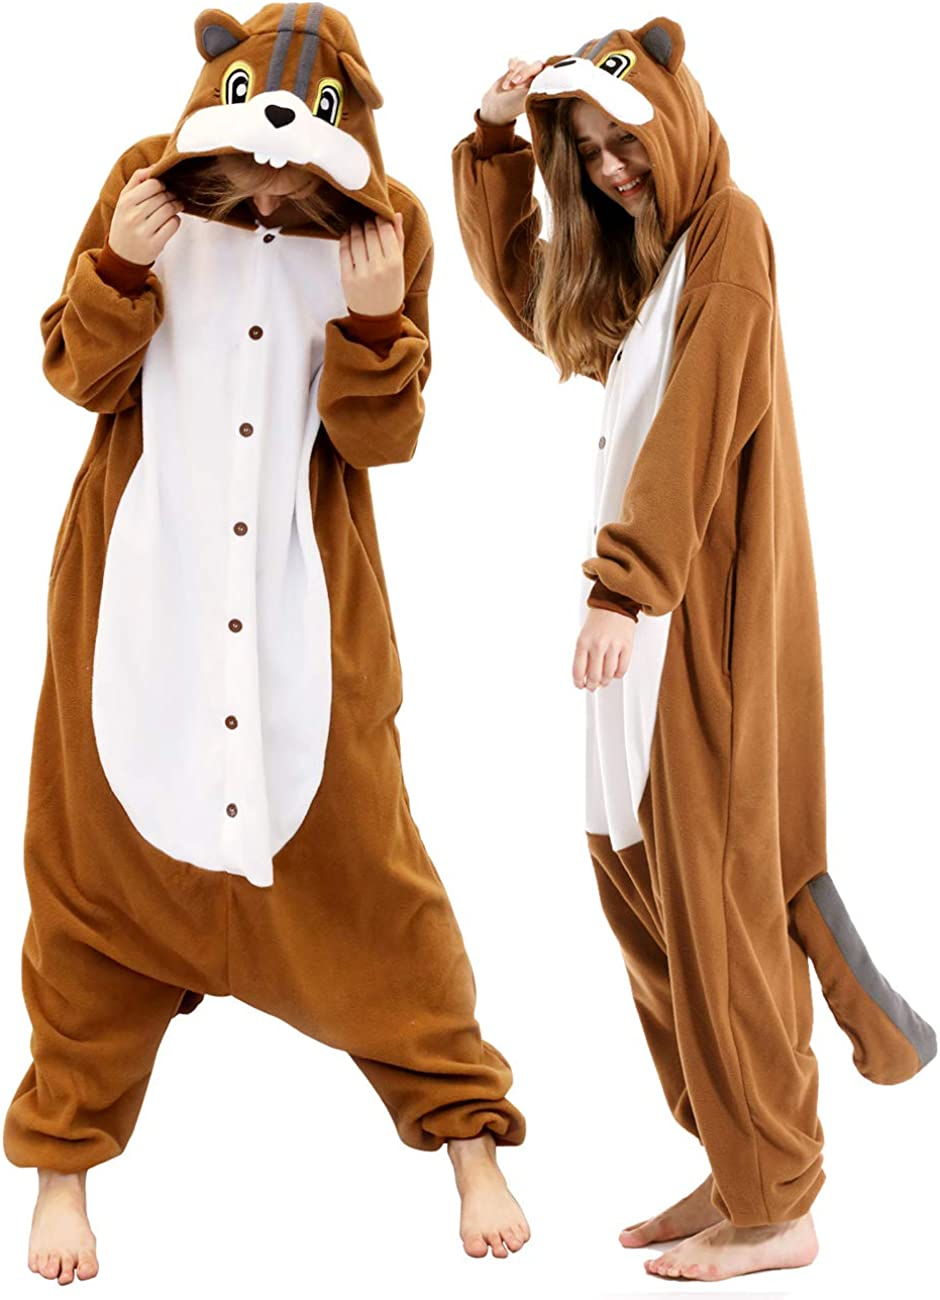 Amazon Com Vavalad Adult Squirrel Pajamas Cosplay Animal Christmas Onesie Costume Women Men Clothing